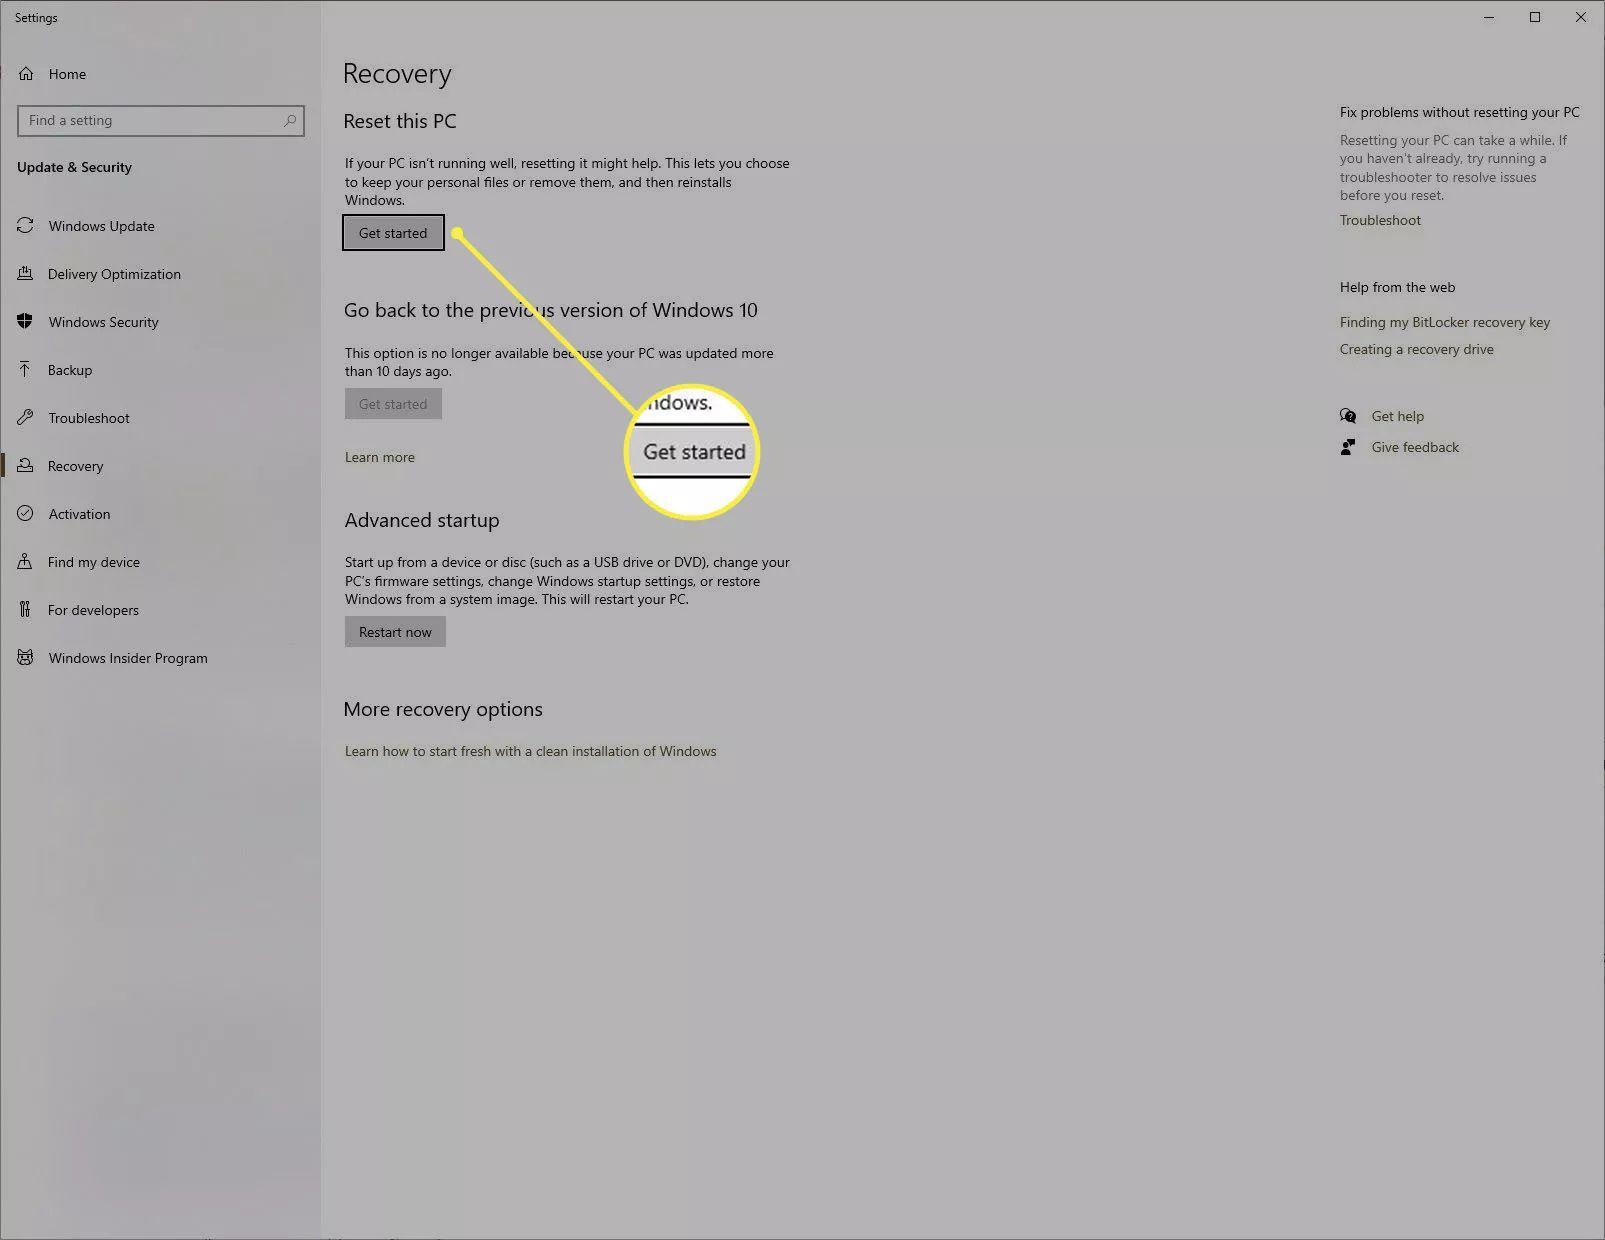 Windows 10 system reset